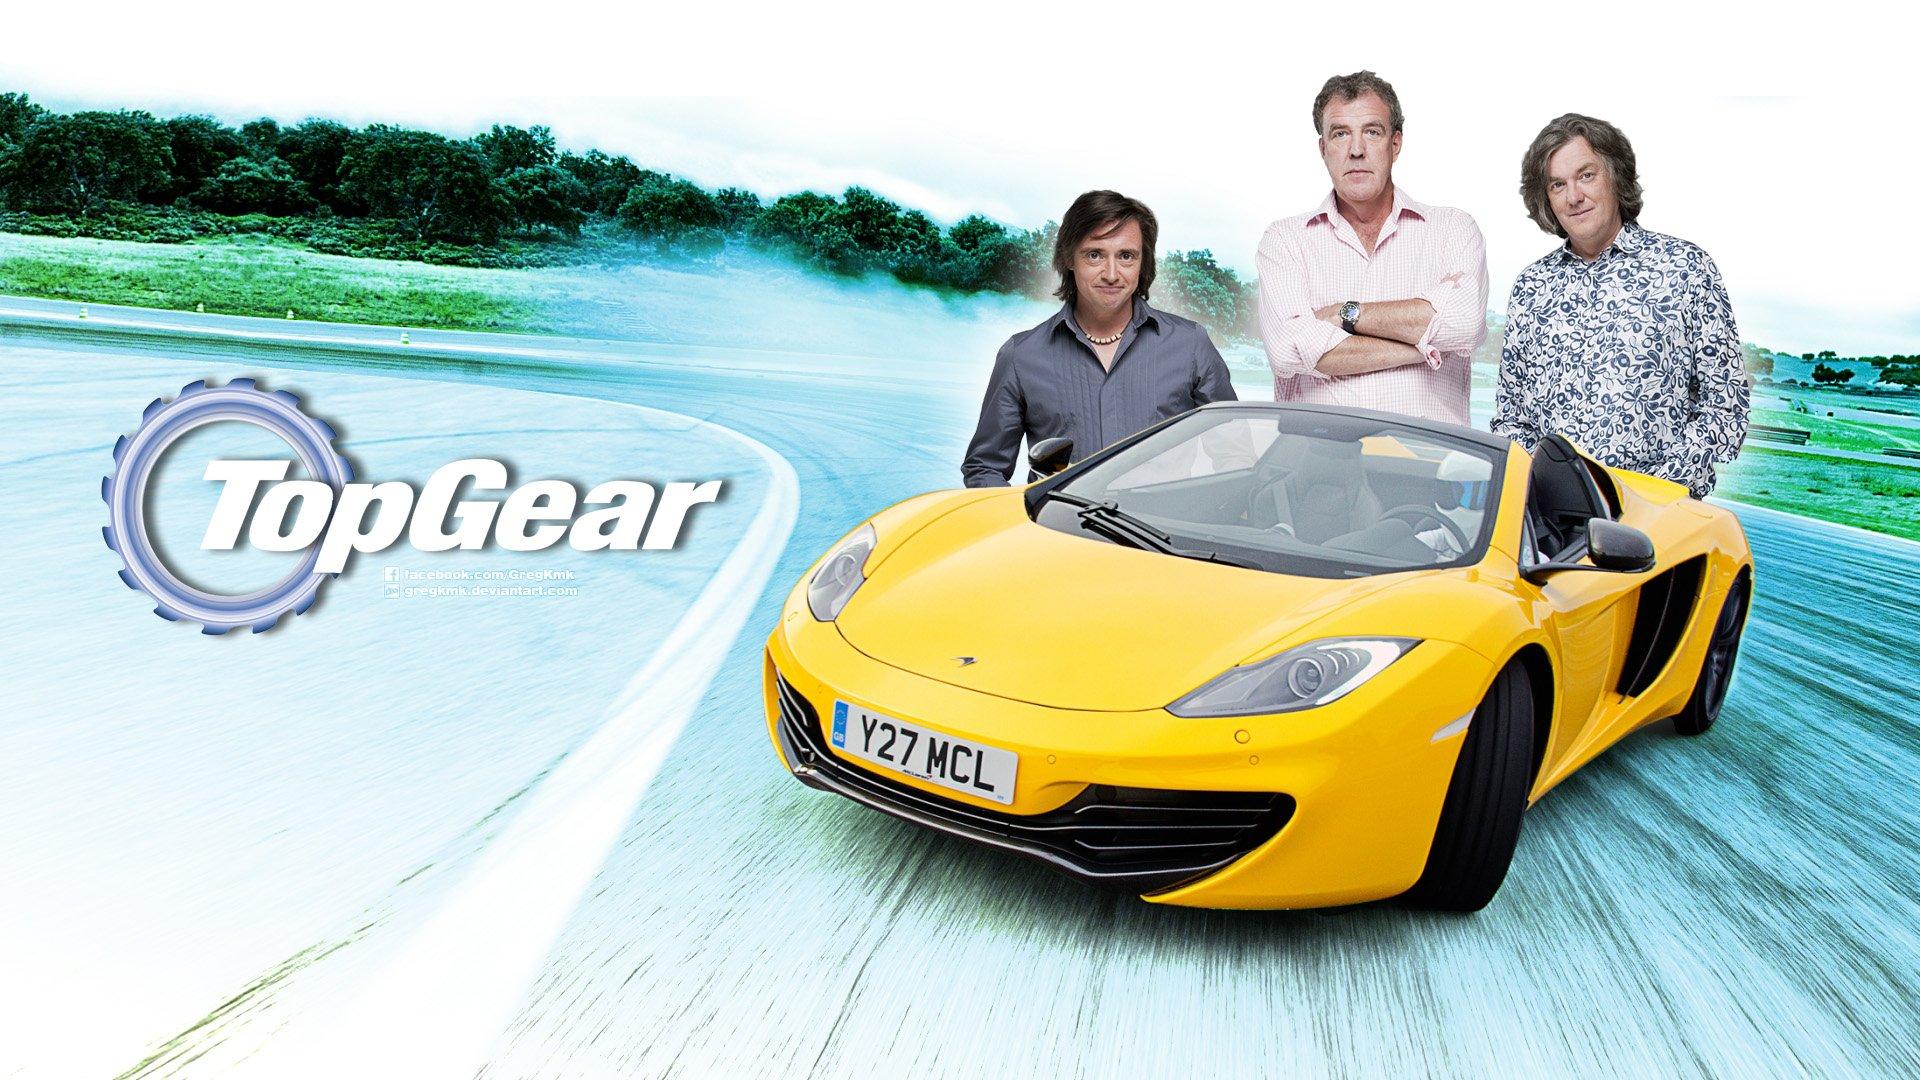 TV Show - Top Gear  Richard Hammond James May Jerremy Clarkson Spider McLaren Wallpaper